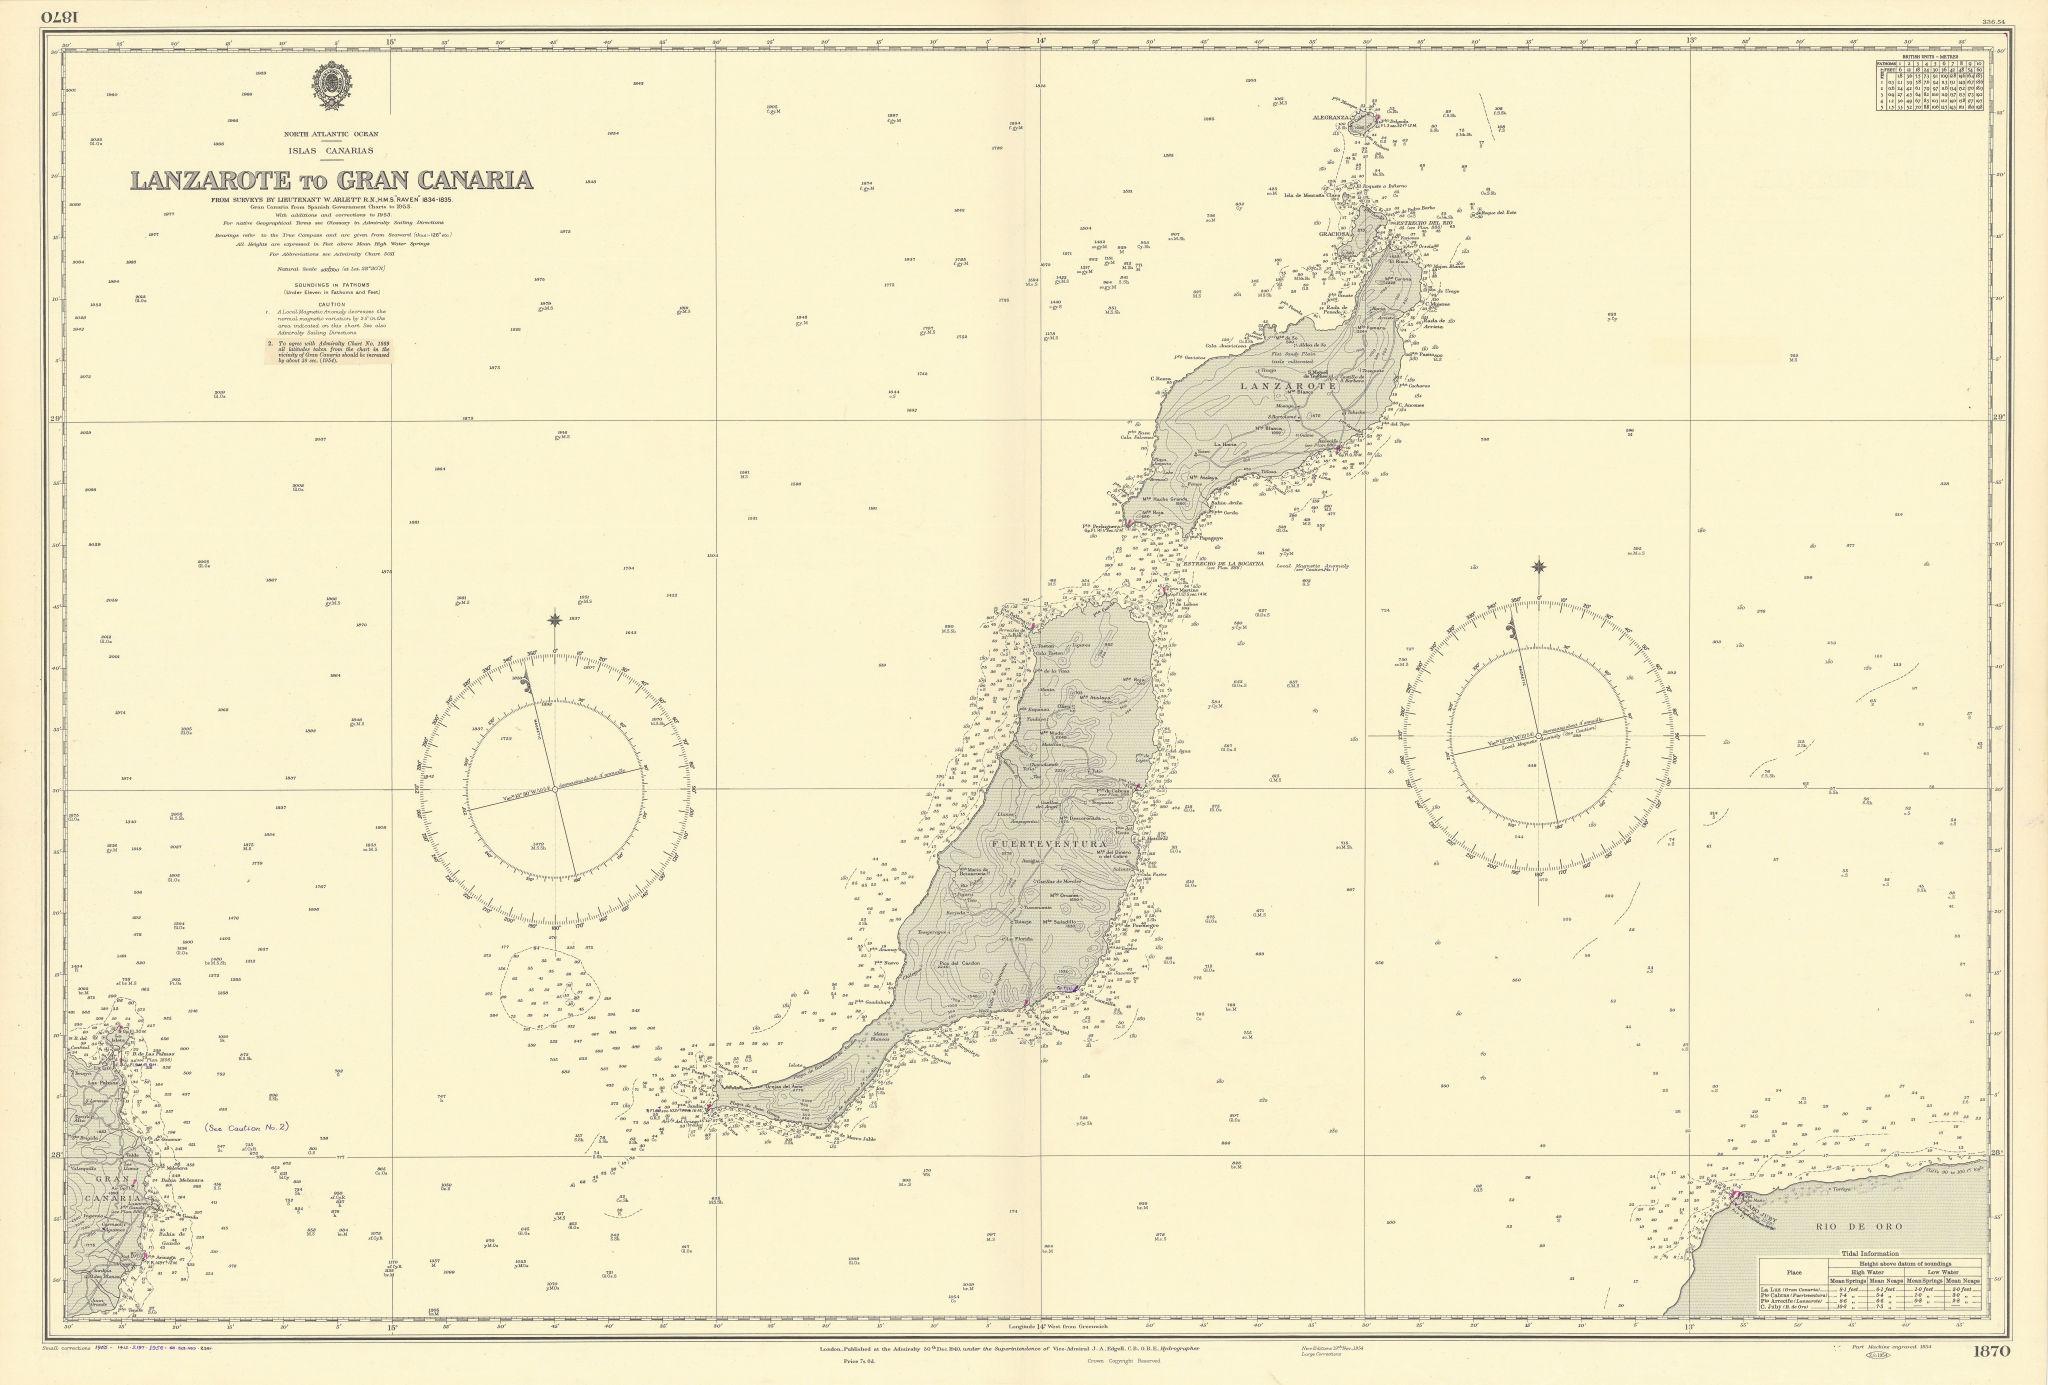 Canarias Lanzarote Fuerteventura Canary Islands ADMIRALTY chart 1940 (1956) map